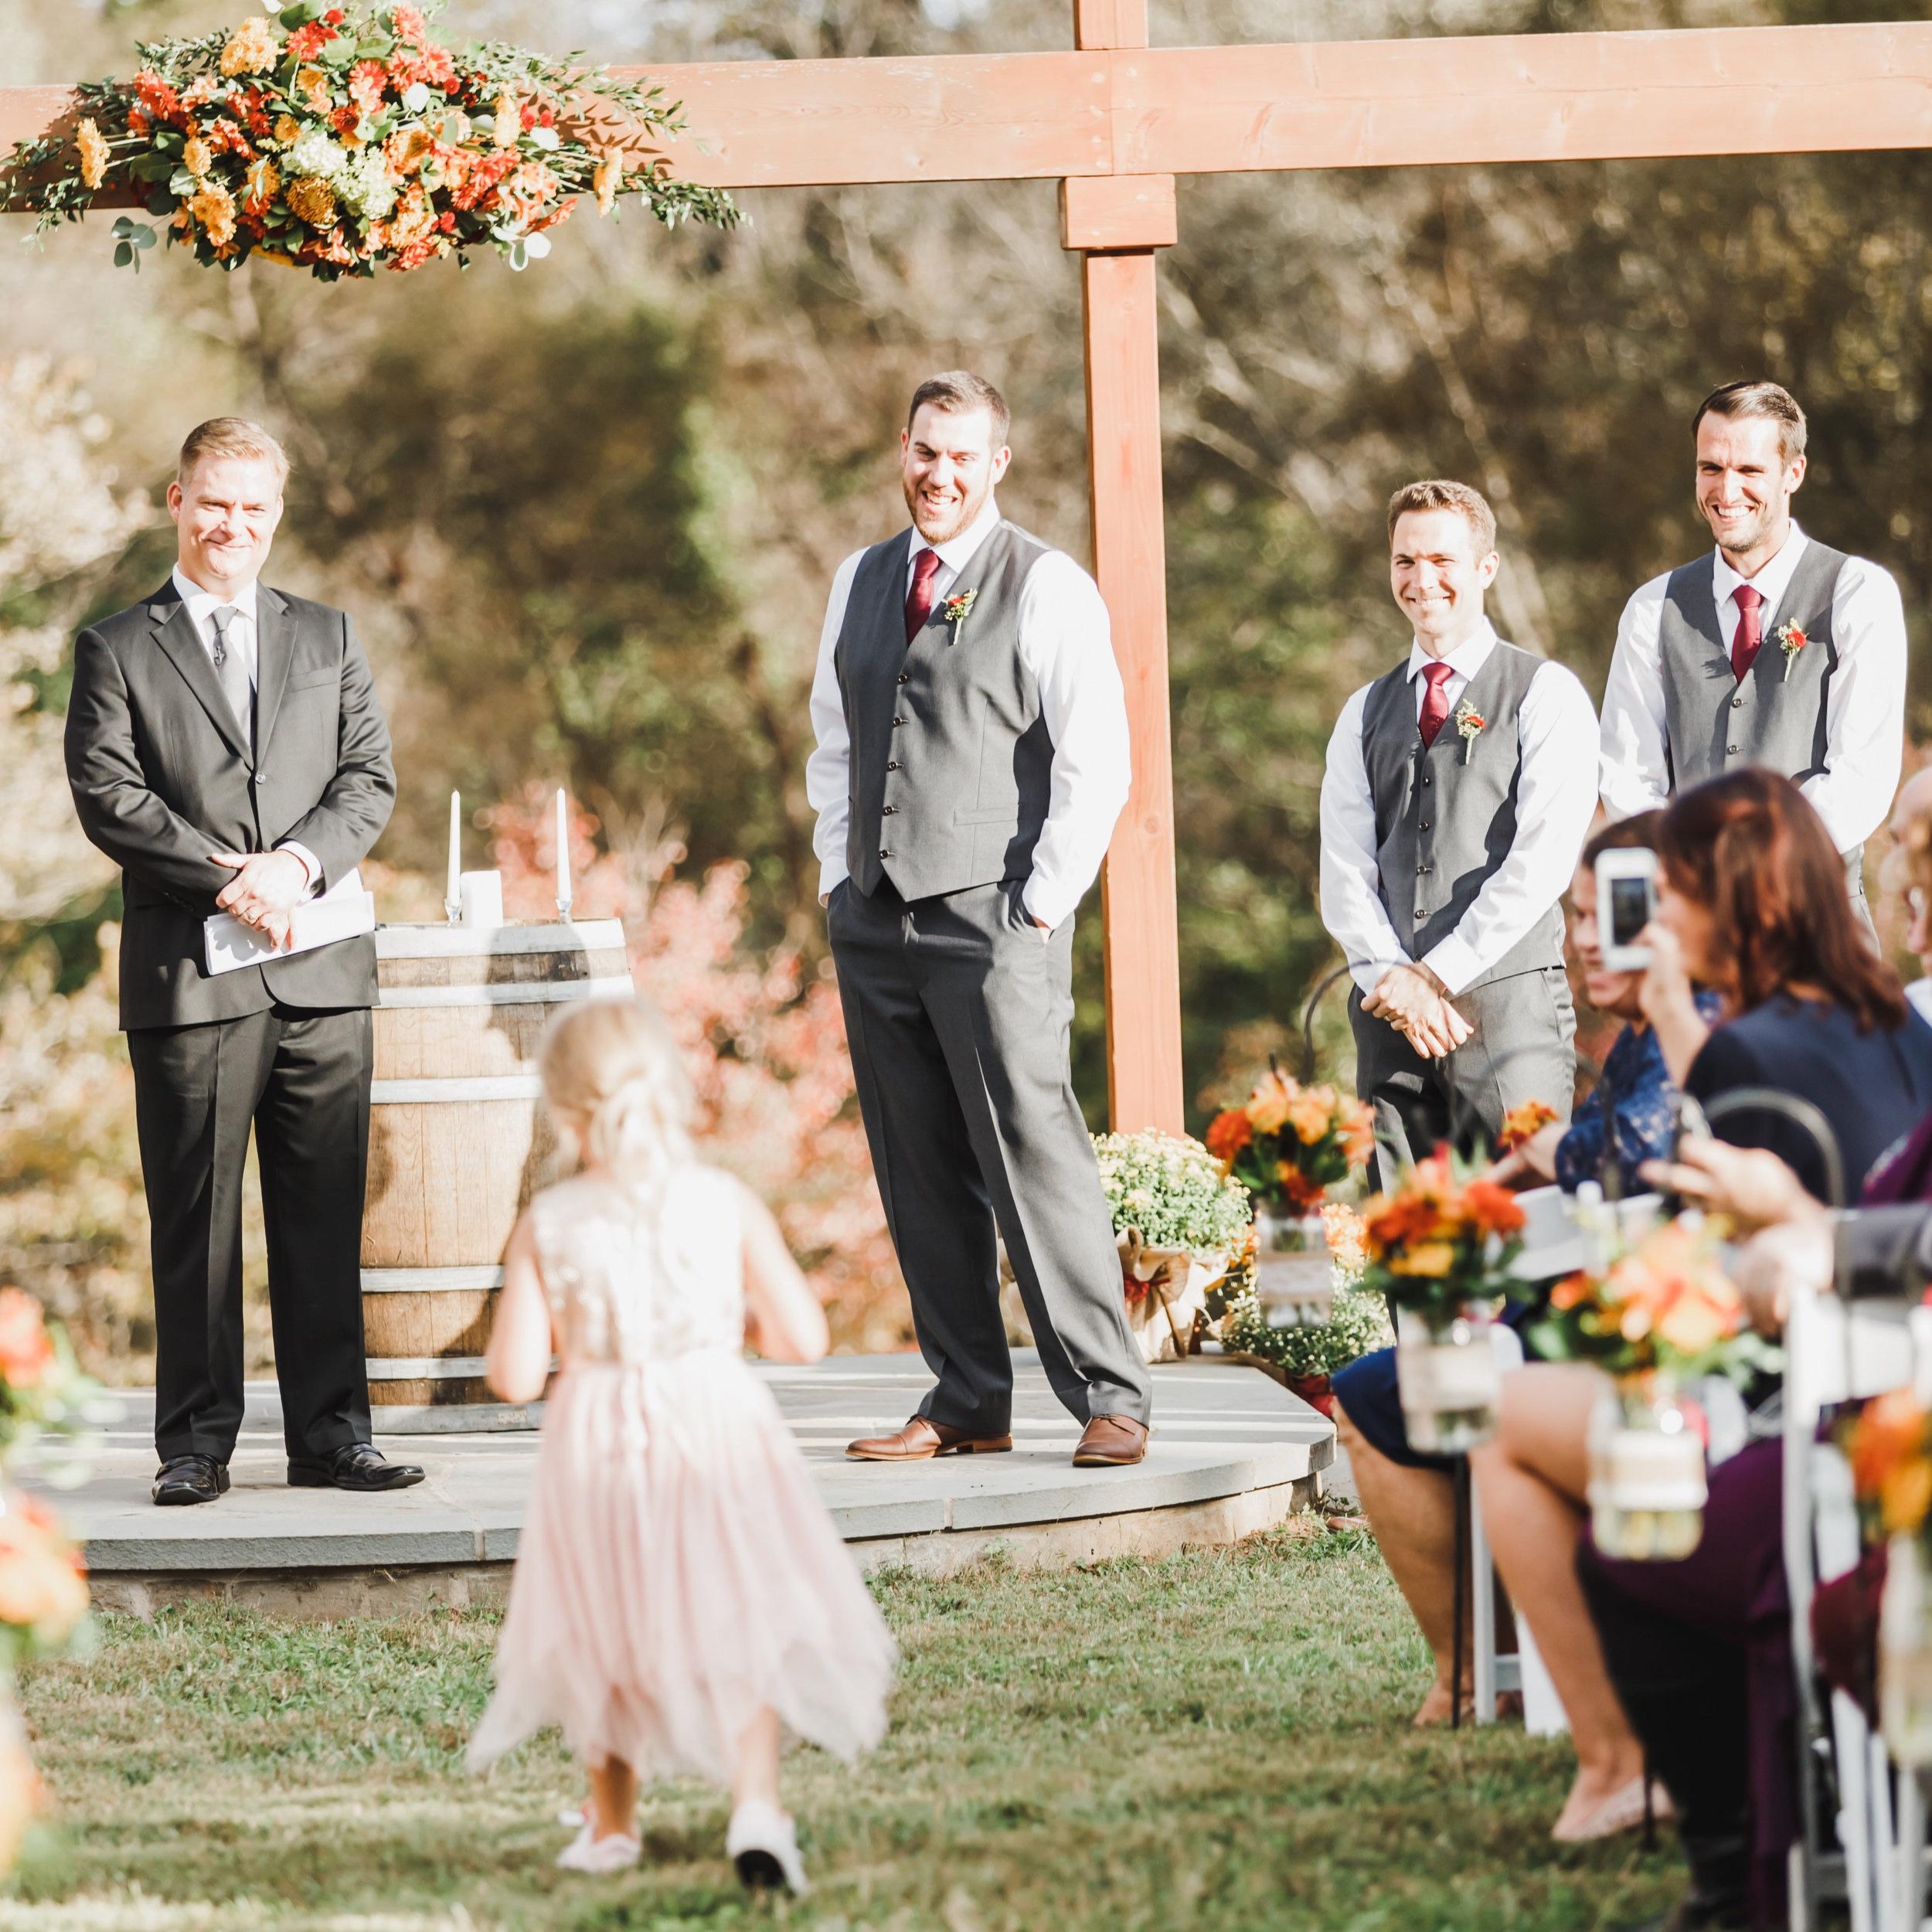 Fling+-+Virginia+Wedding+Photographer+-+Photography+by+Amy+Nicole-247-14.jpg